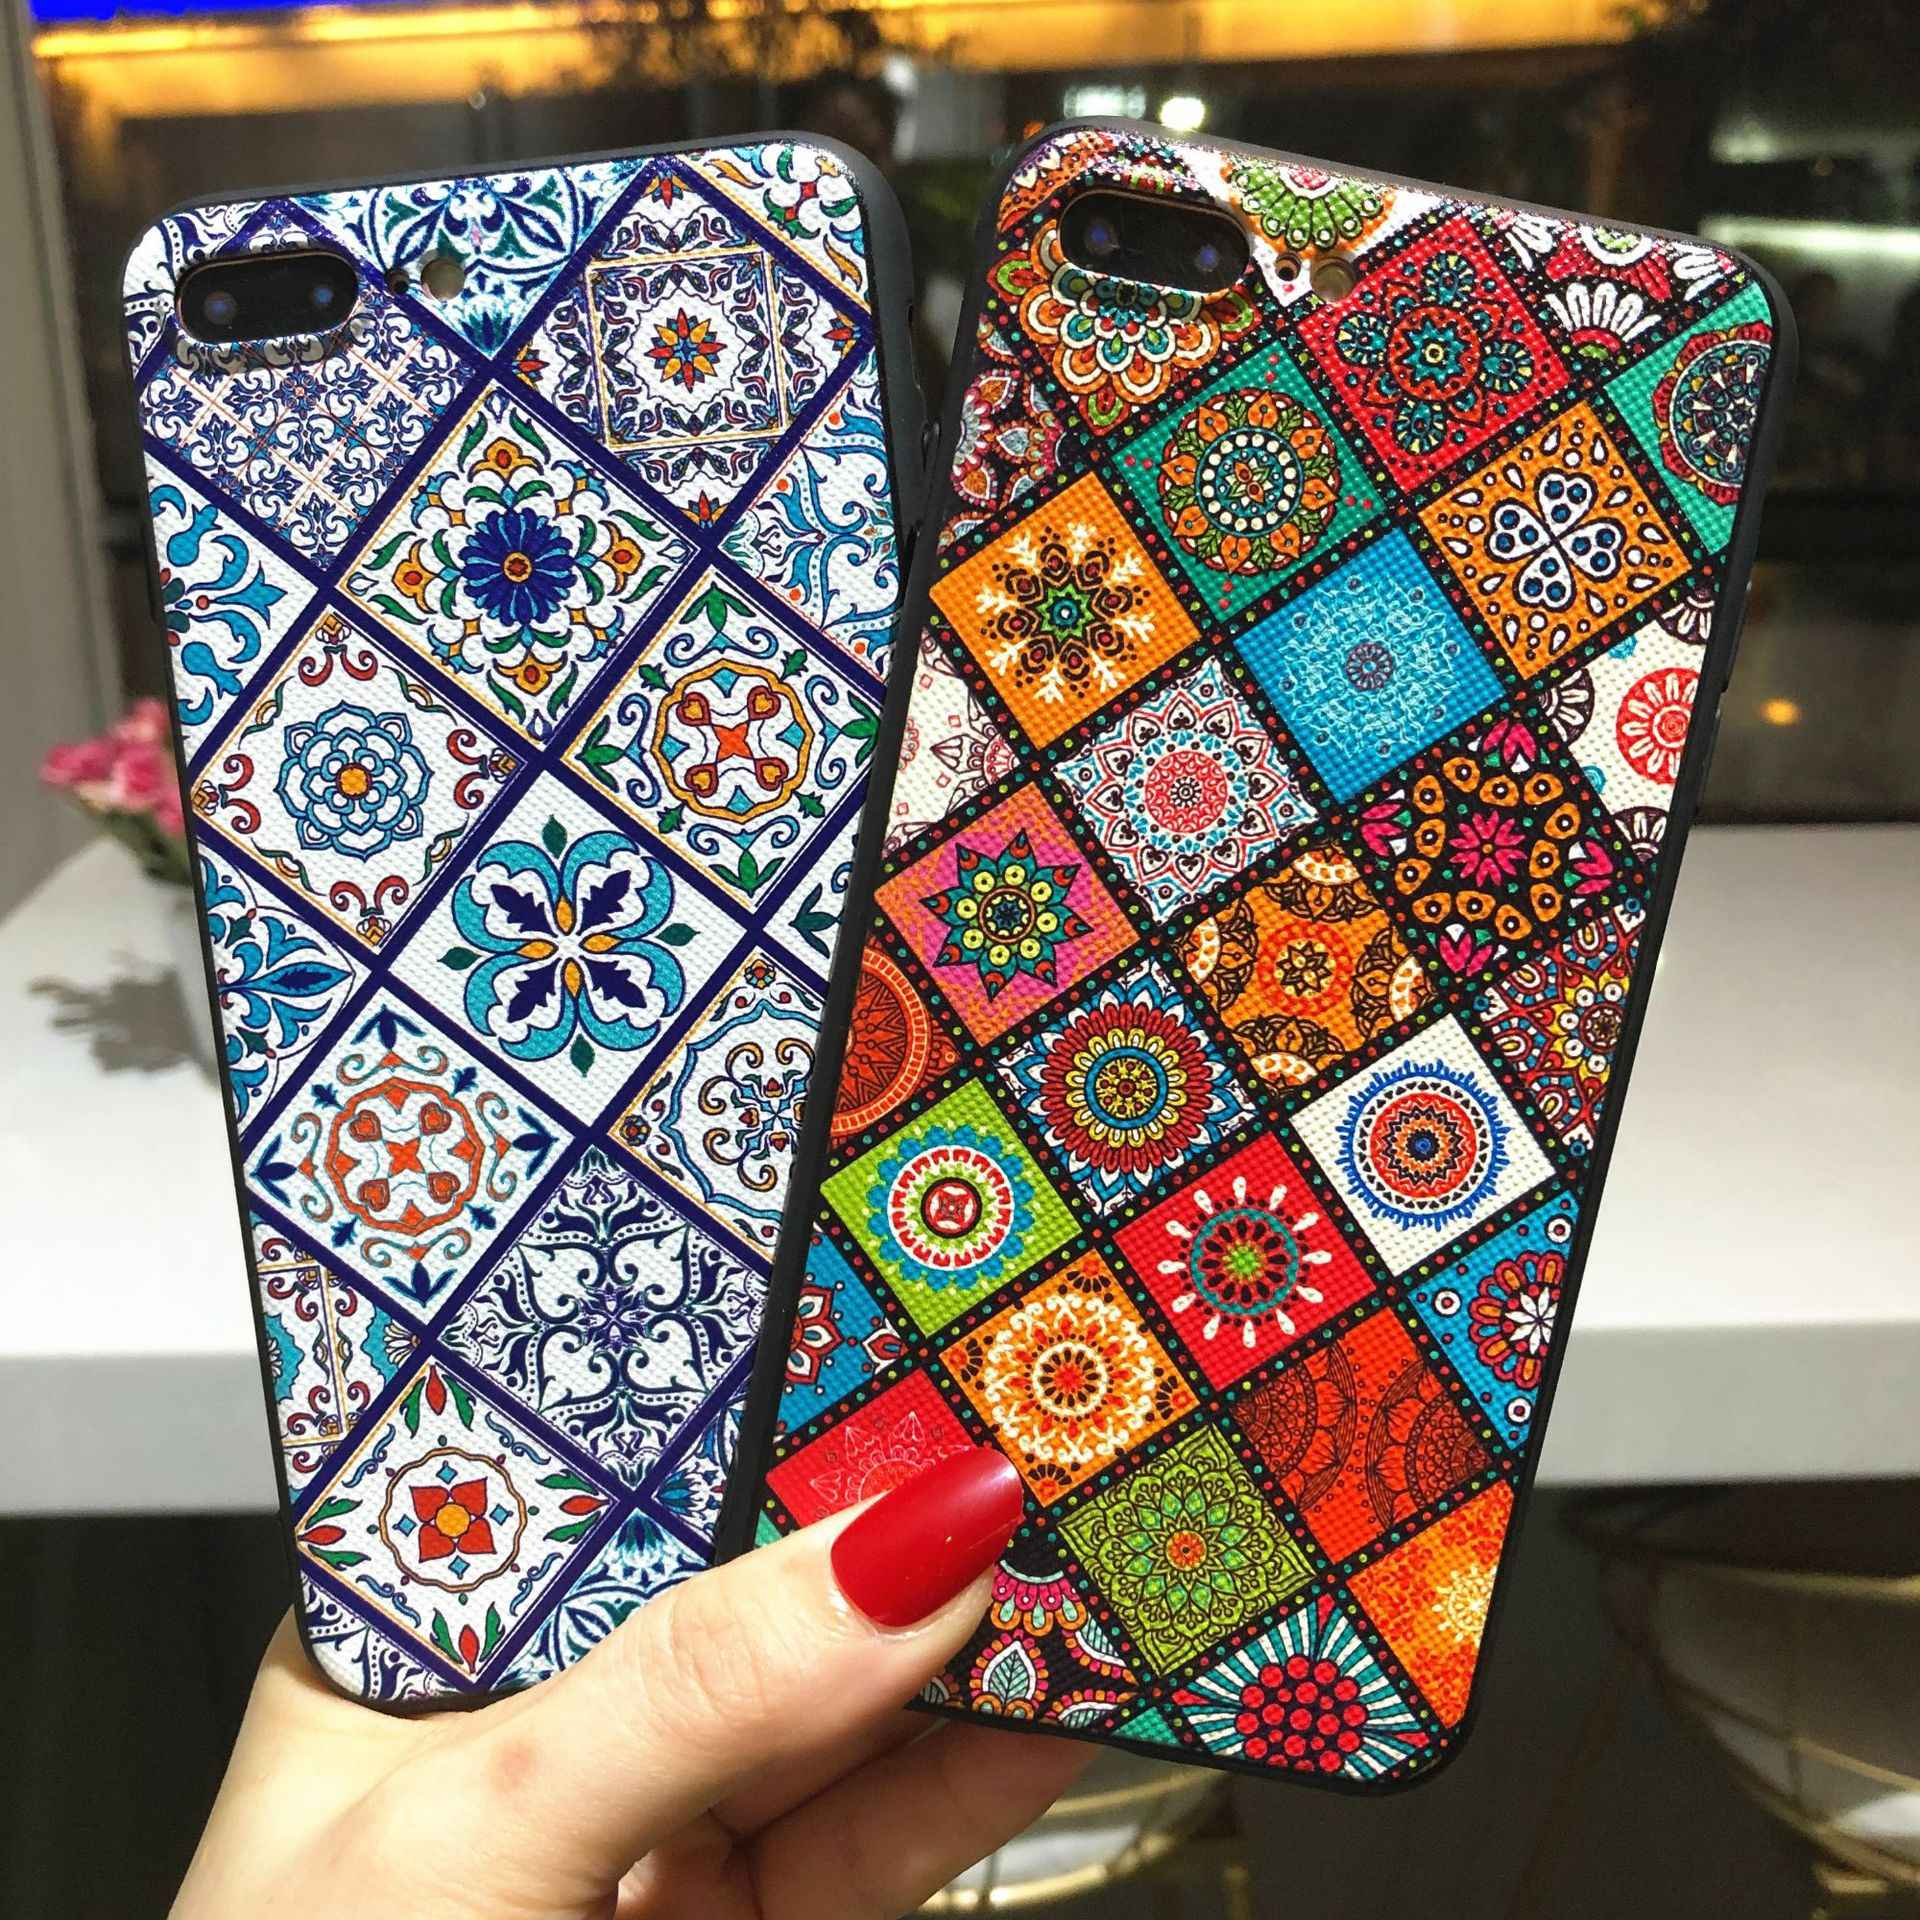 Çiçek kabartma Samsung kılıfı A70 telefon kılıfı yumuşak silikon arka kapak Samsung Galaxy A10 A20 A30 A40 A50 A30S A50S A10S A20E